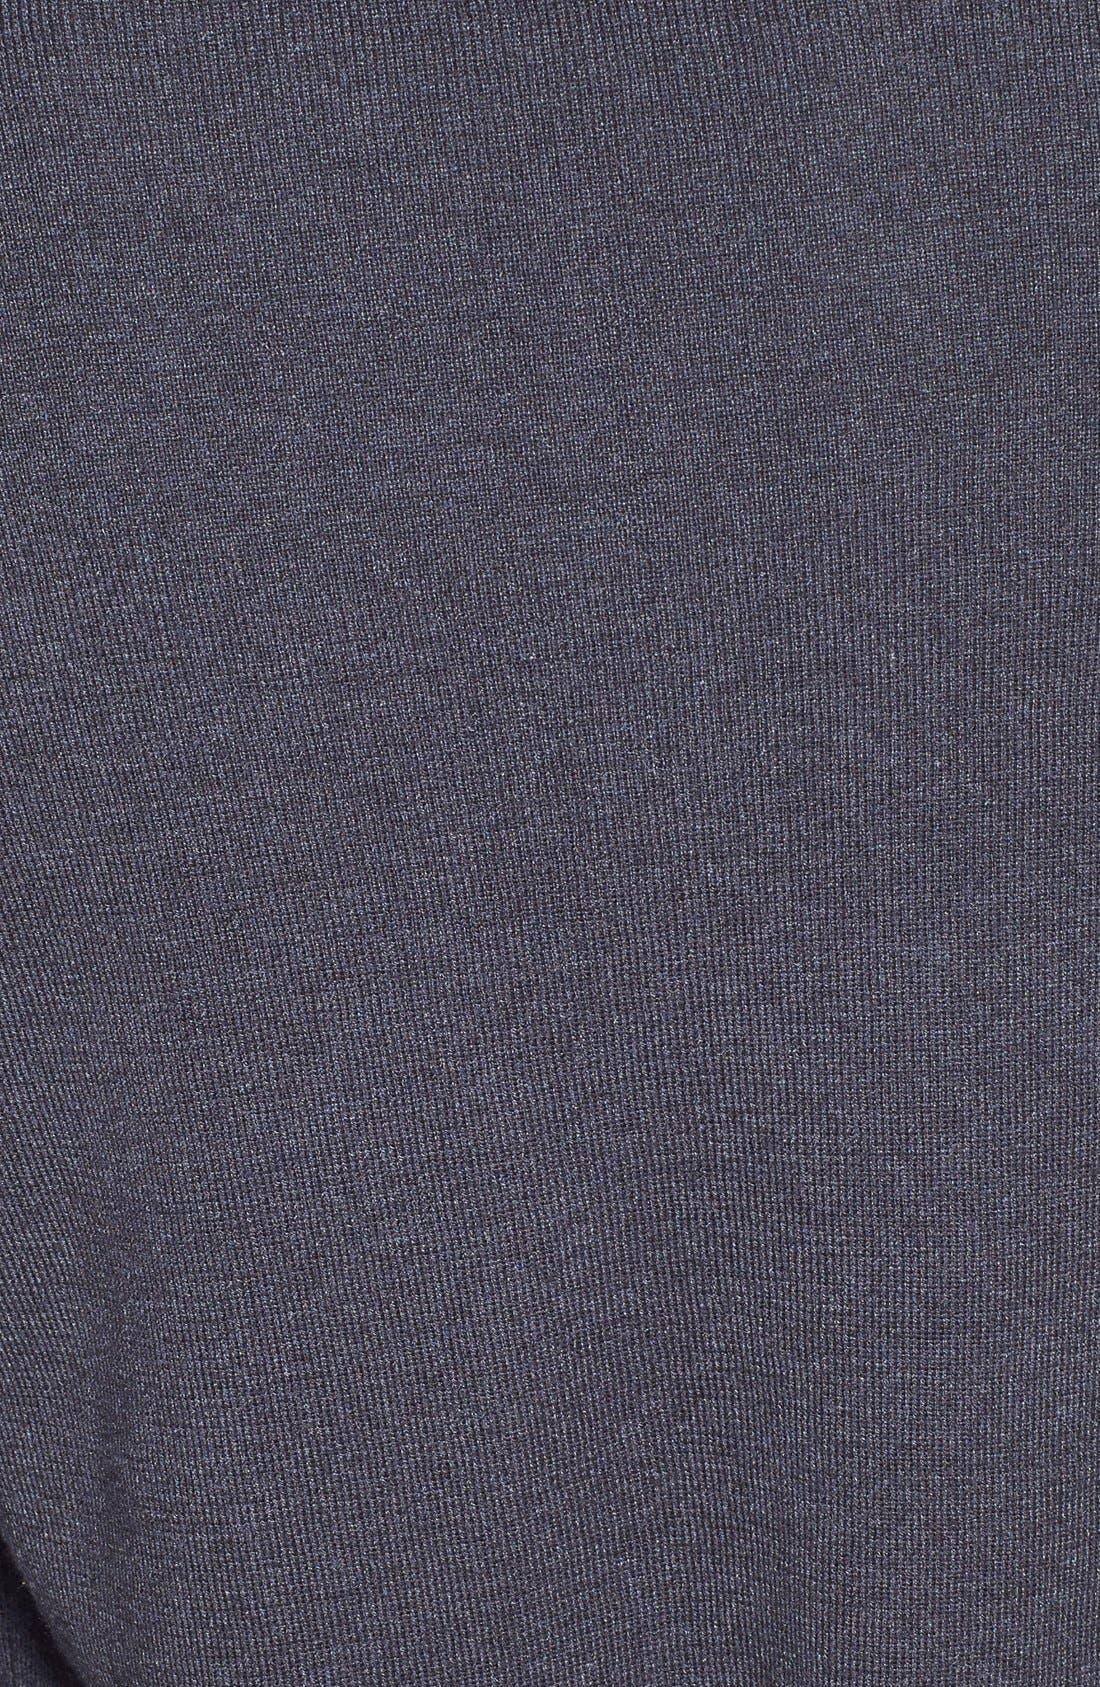 Alternate Image 3  - NIC+ZOE Four-Way Convertible Cardigan (Regular & Petite)